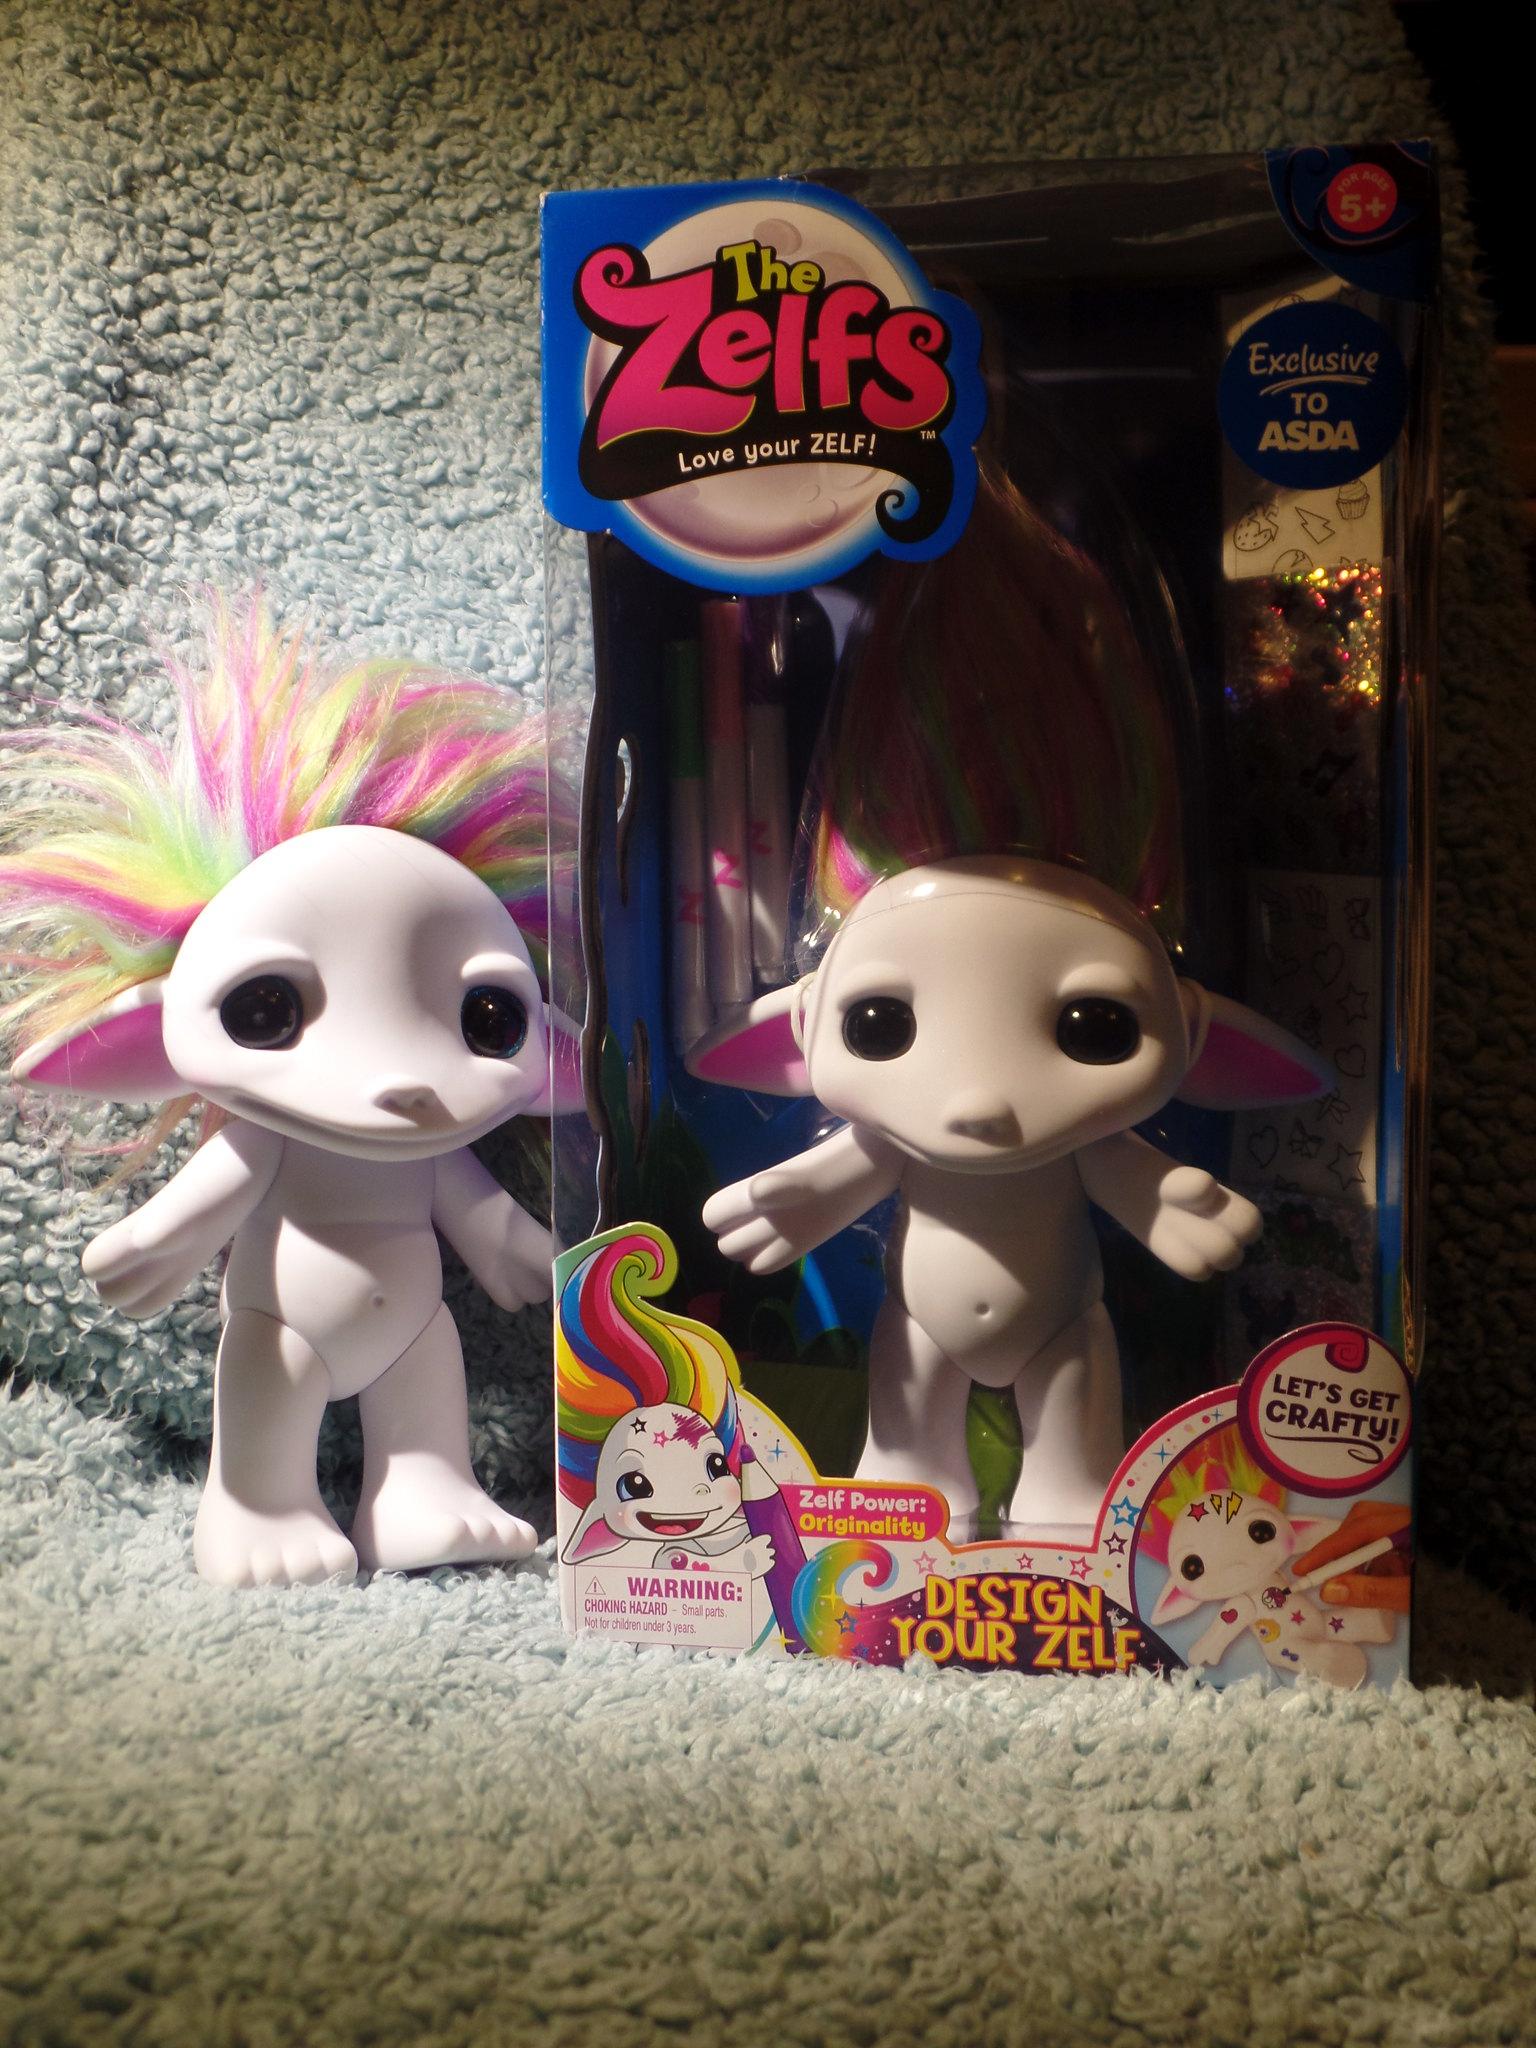 Extreem Opps, I collect Dolls HN-79